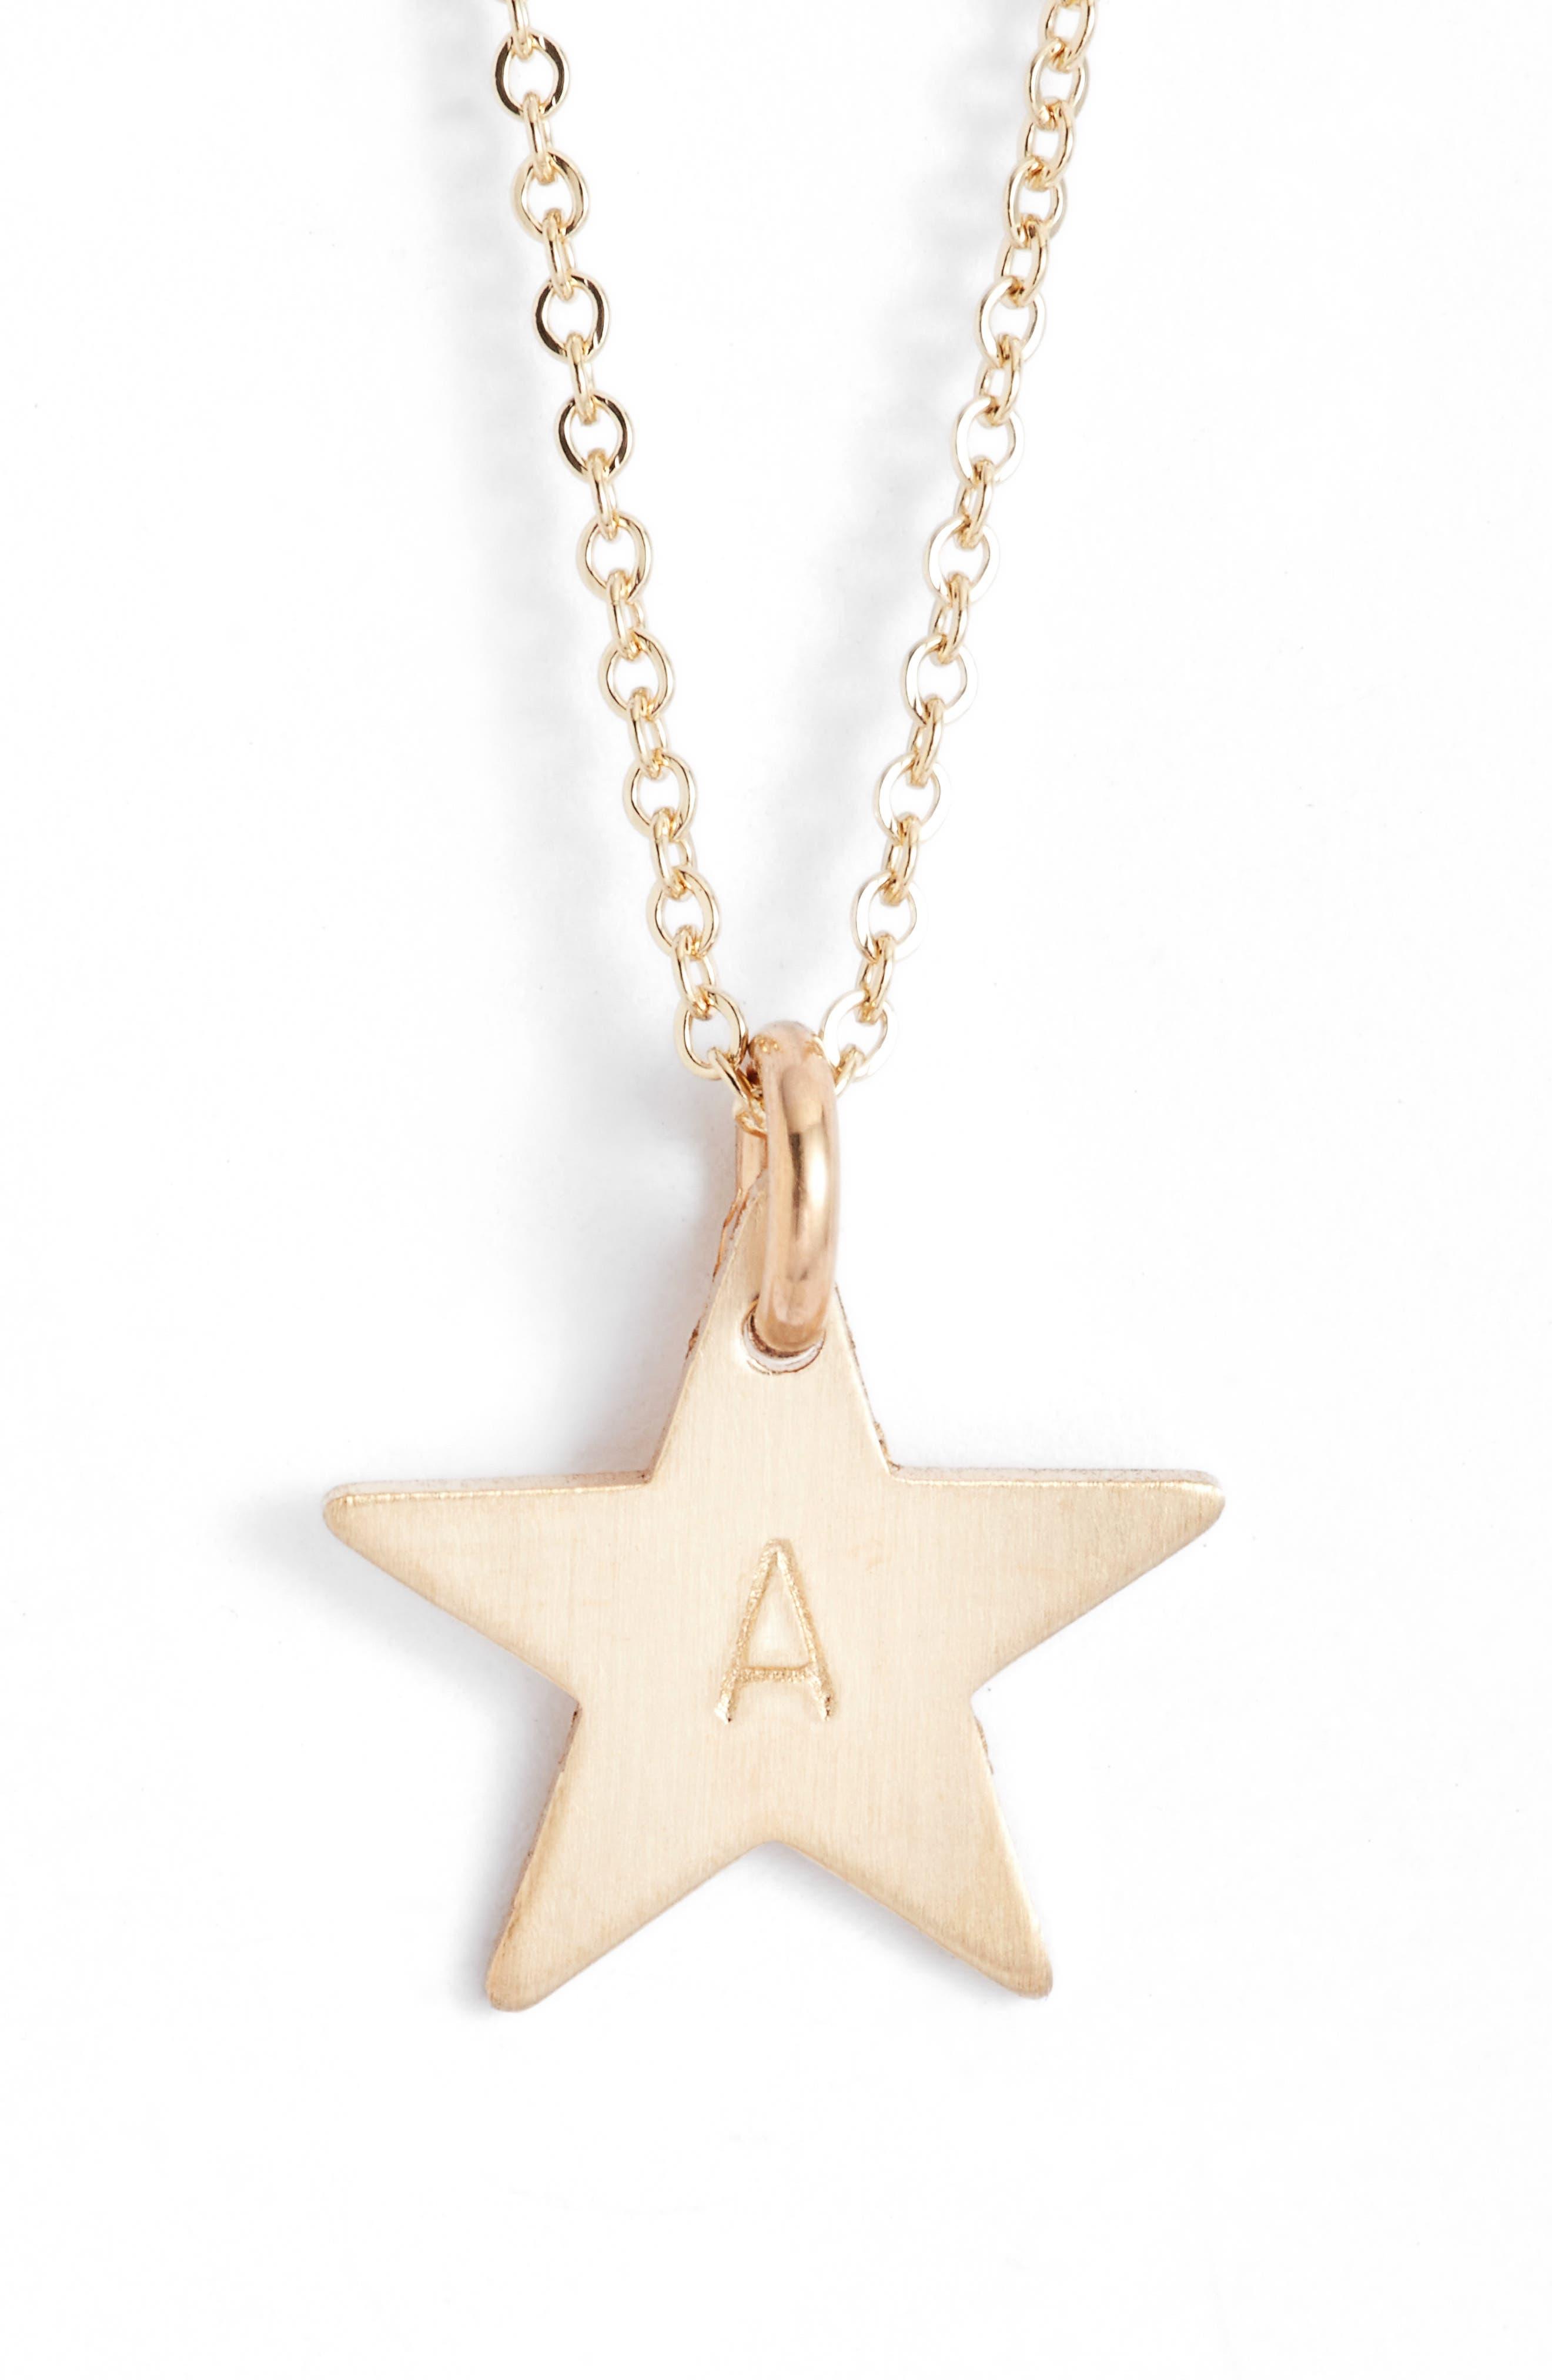 14k-Gold Fill Initial Mini Star Pendant Necklace,                             Main thumbnail 1, color,                             710